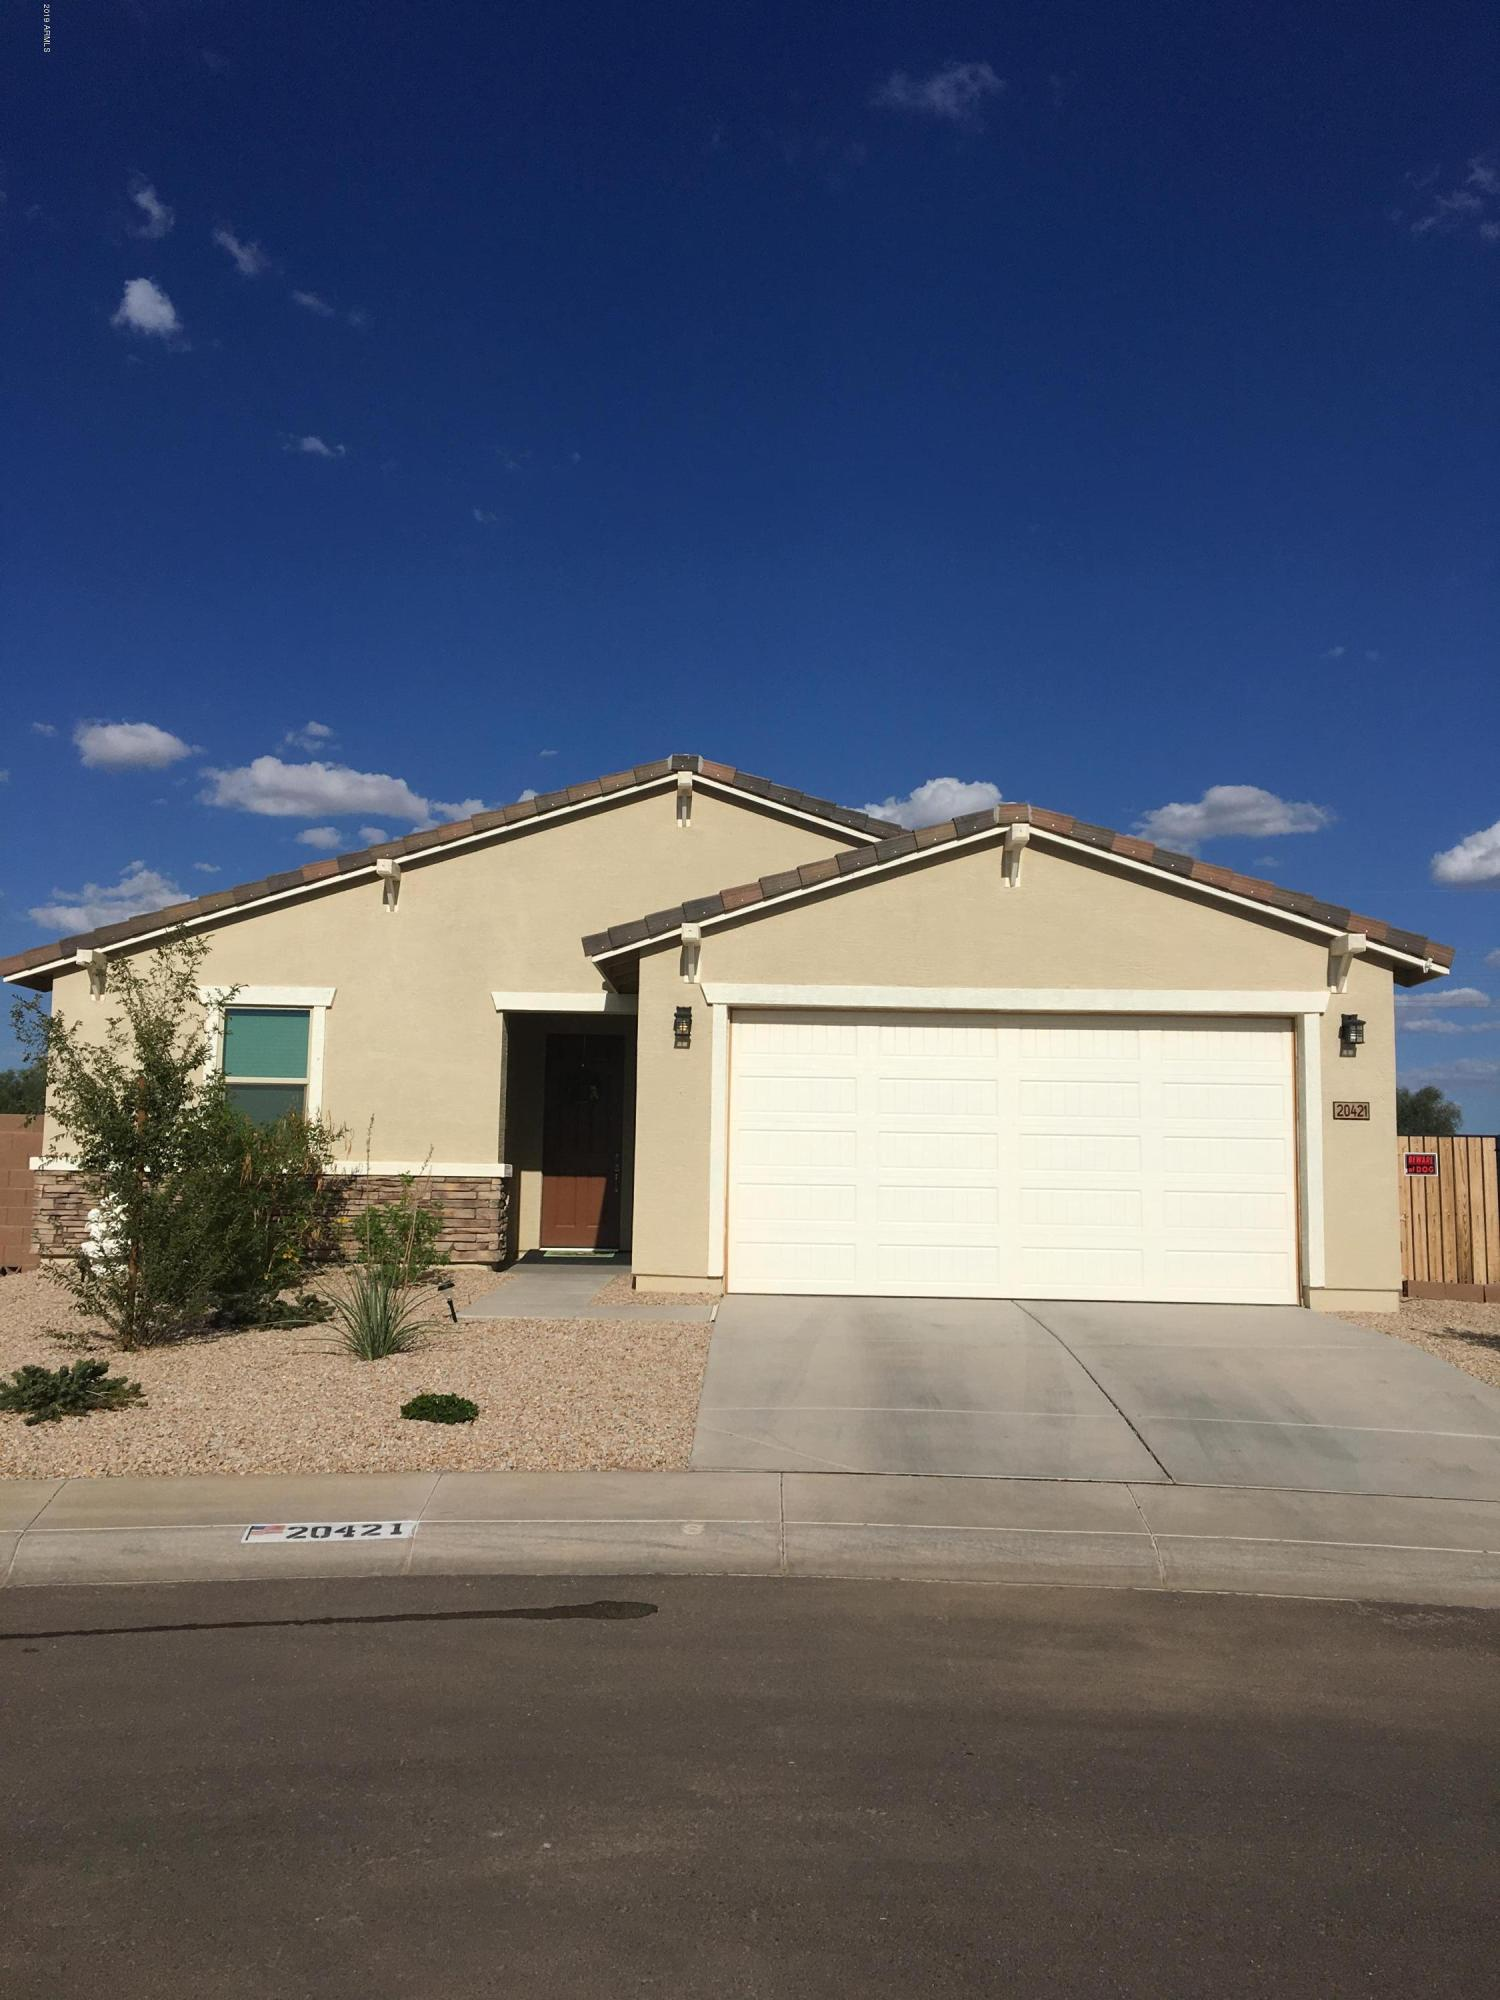 Photo of 20421 N GRANTHAM Road, Maricopa, AZ 85138